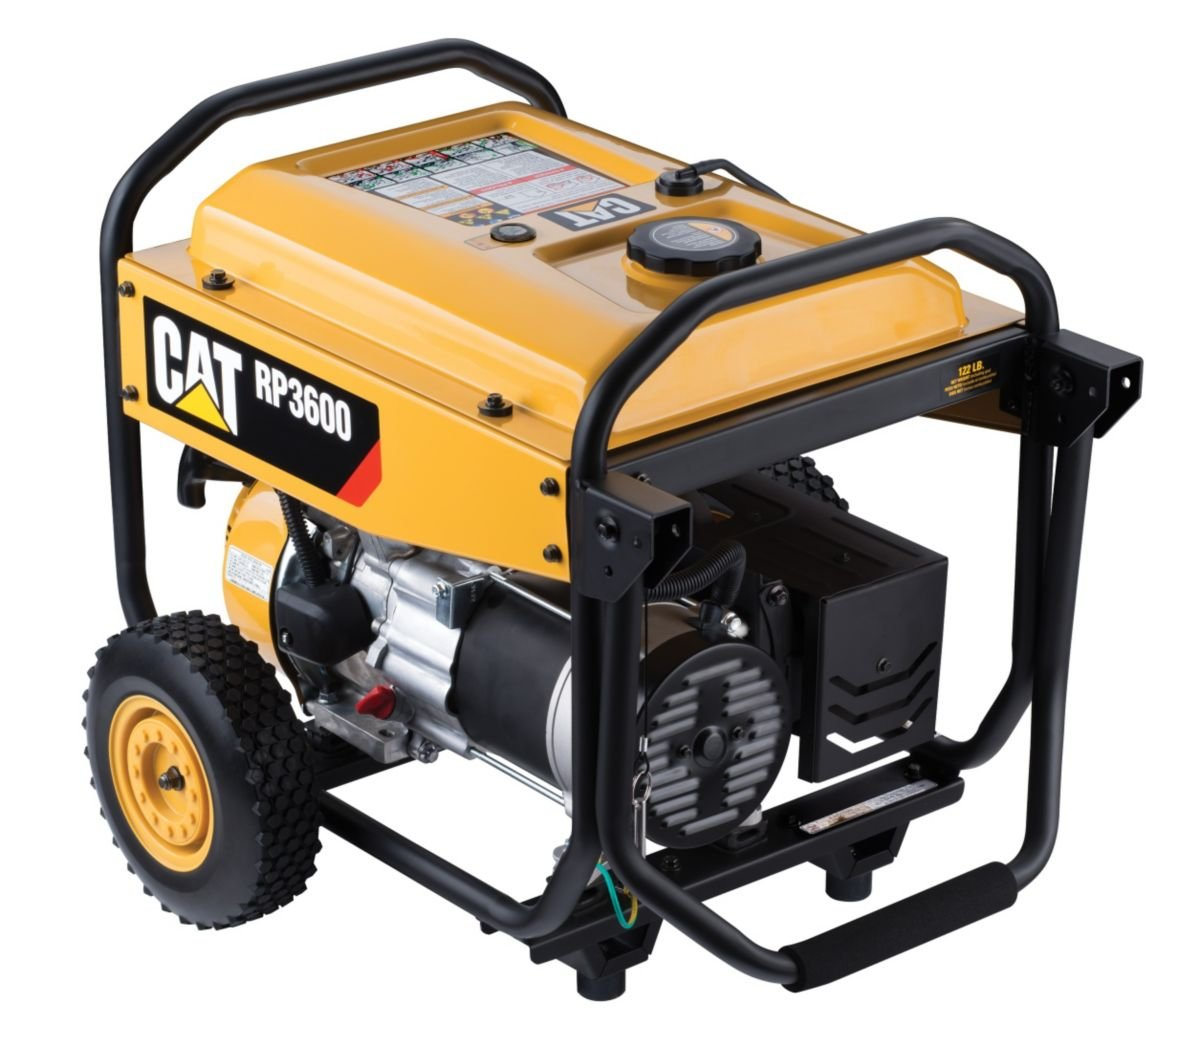 Cat Rp3600 3600 Running Watts 4500 Starting Gas Duramax Fuel Filter Powered Portable Generator 490 6488 Garden Outdoor